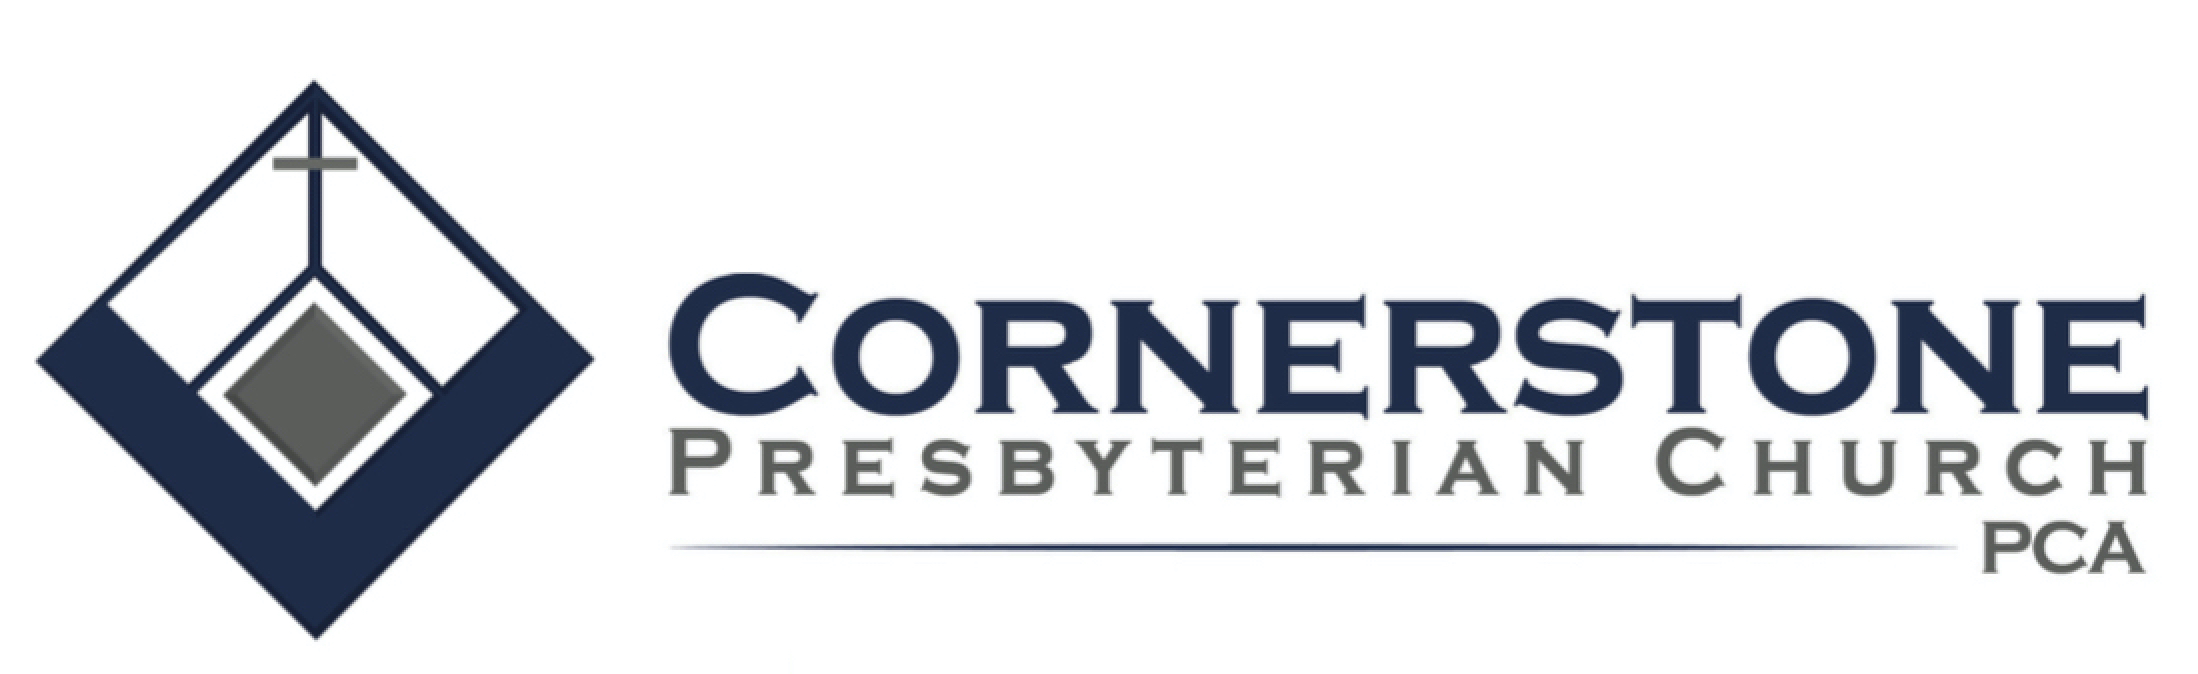 Cornerstone Presbyterian Church, PCA